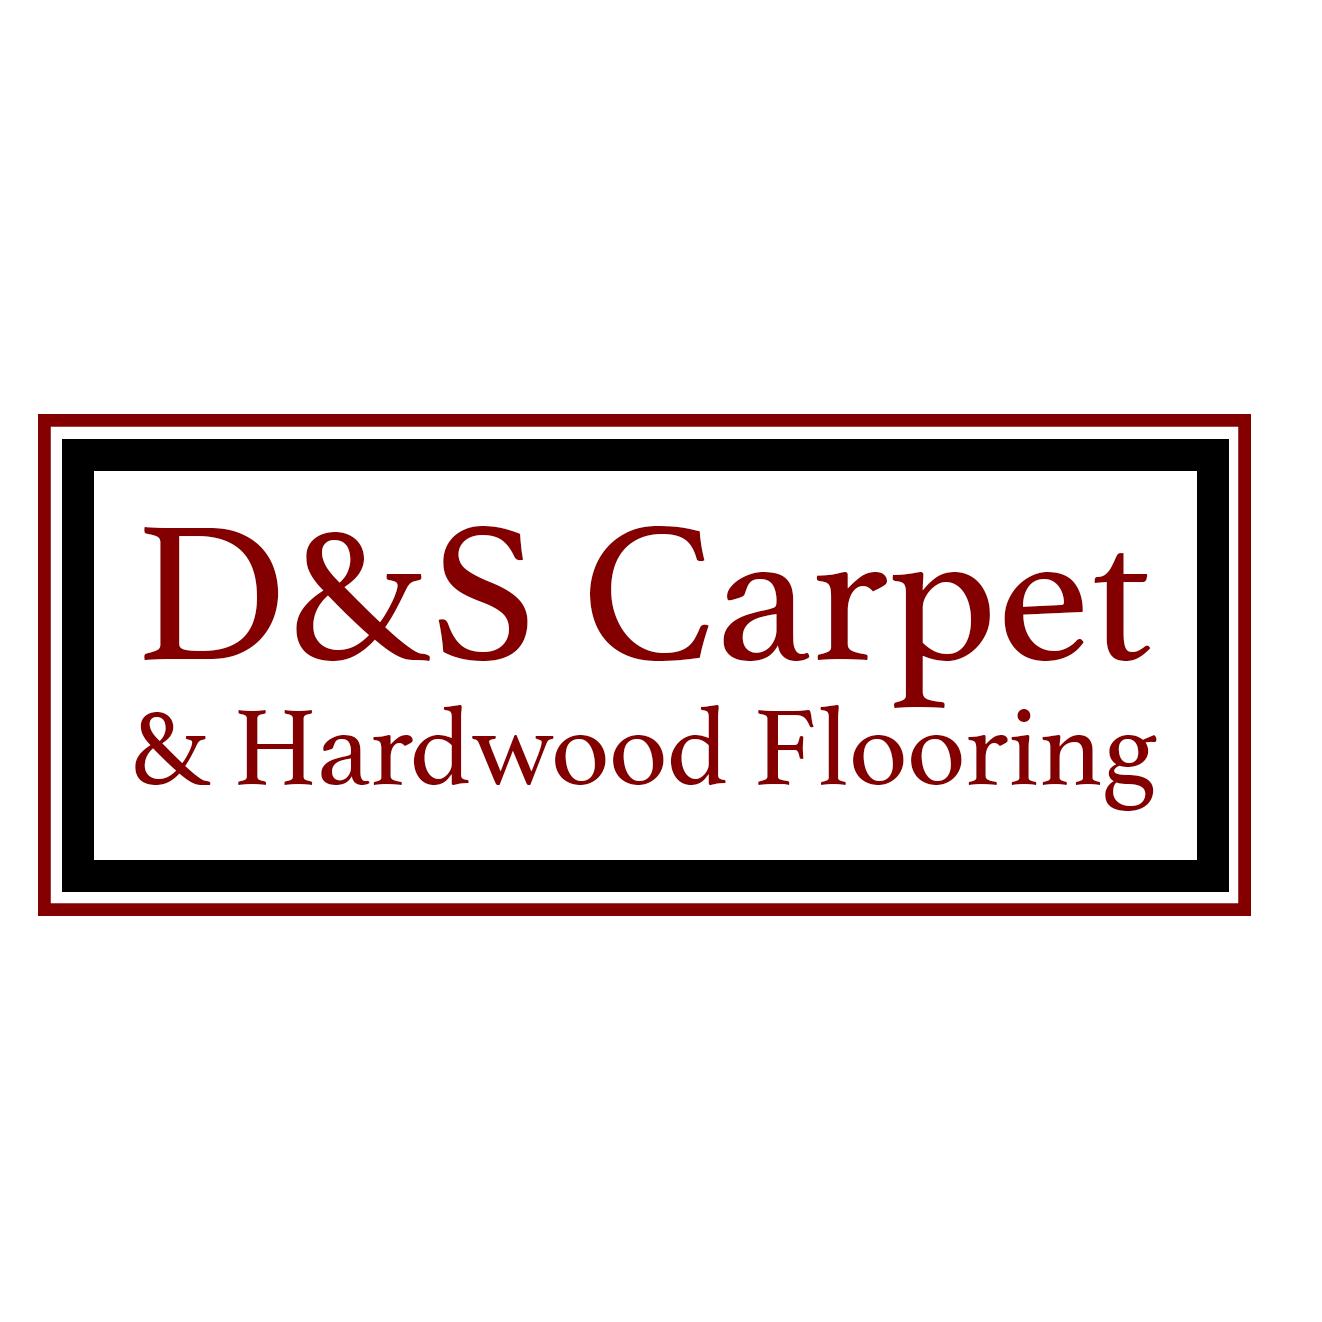 D&S Carpet & Hardwood Flooring